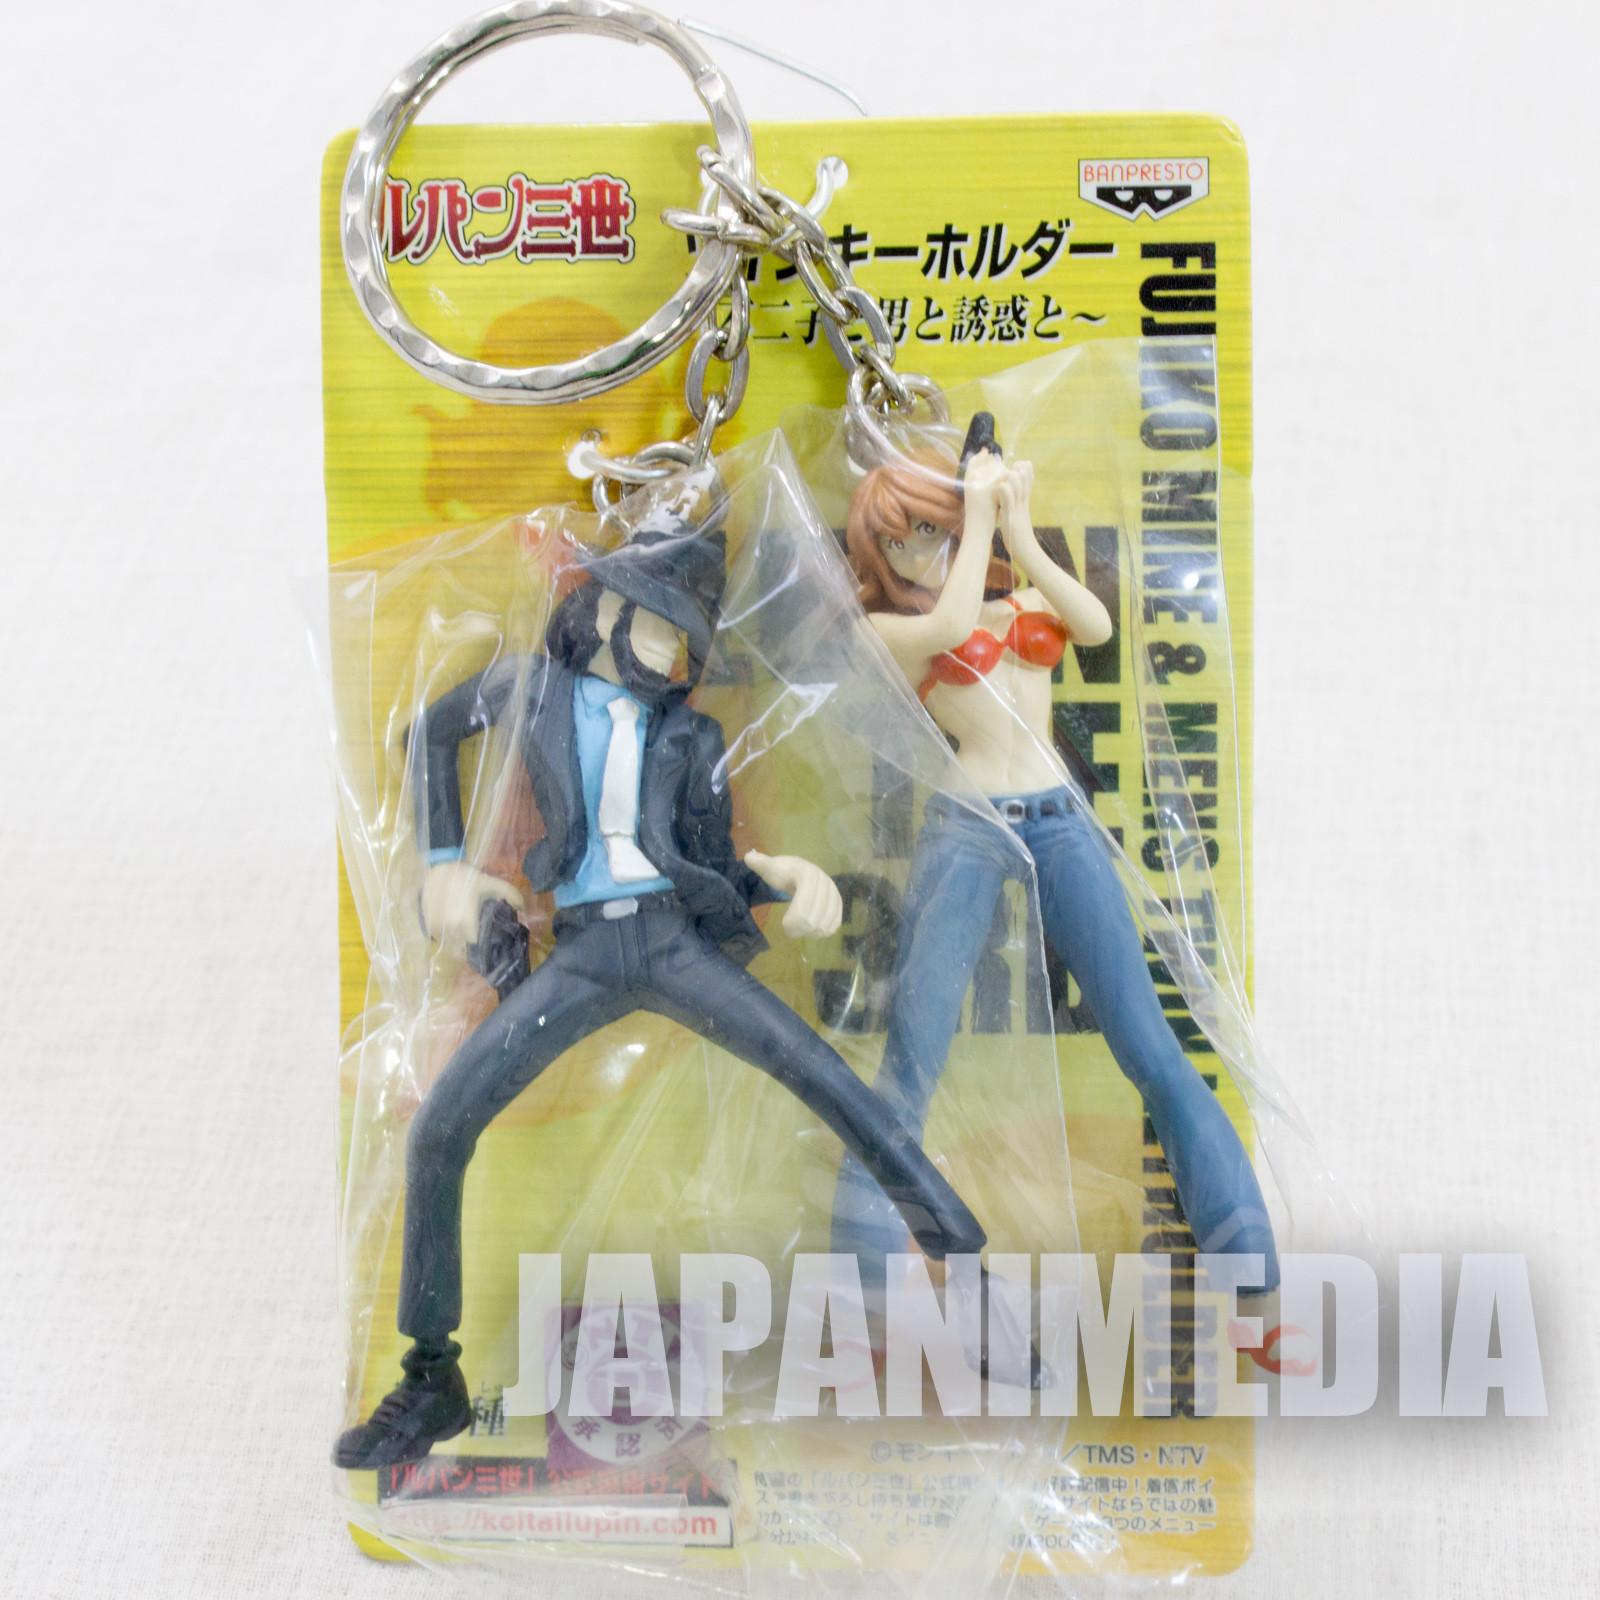 Lupin the Third (3rd) Jigen & Fujiko Mine Figure Keychain Banpresto JAPAN ANIME